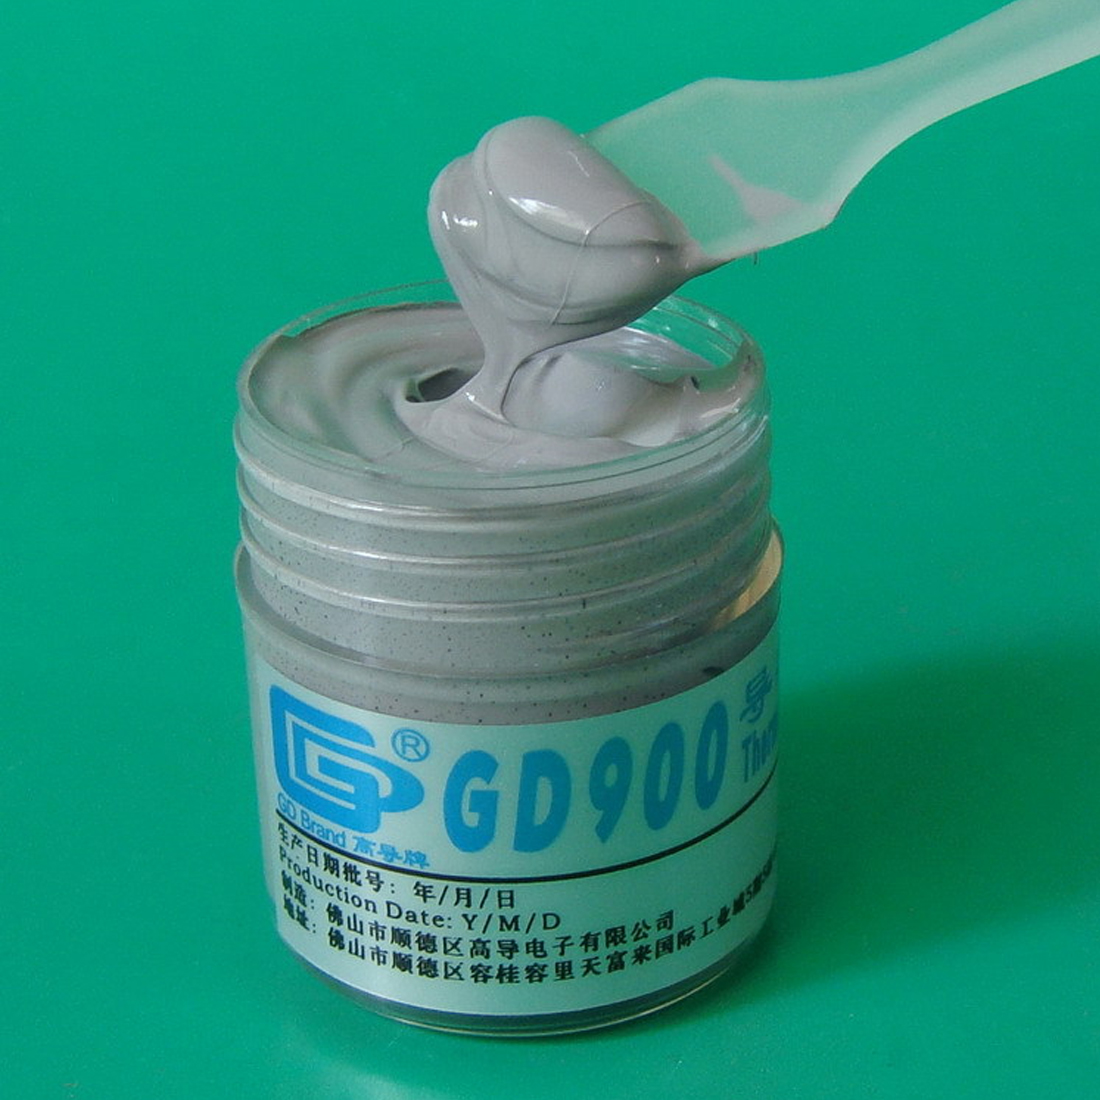 NOYOKERE חם תרמי להדביק סיליקון GD900 צלעות קירור מתחם נטו משקל 30 גרם ביצועים גבוהים עבור מעבד CN30